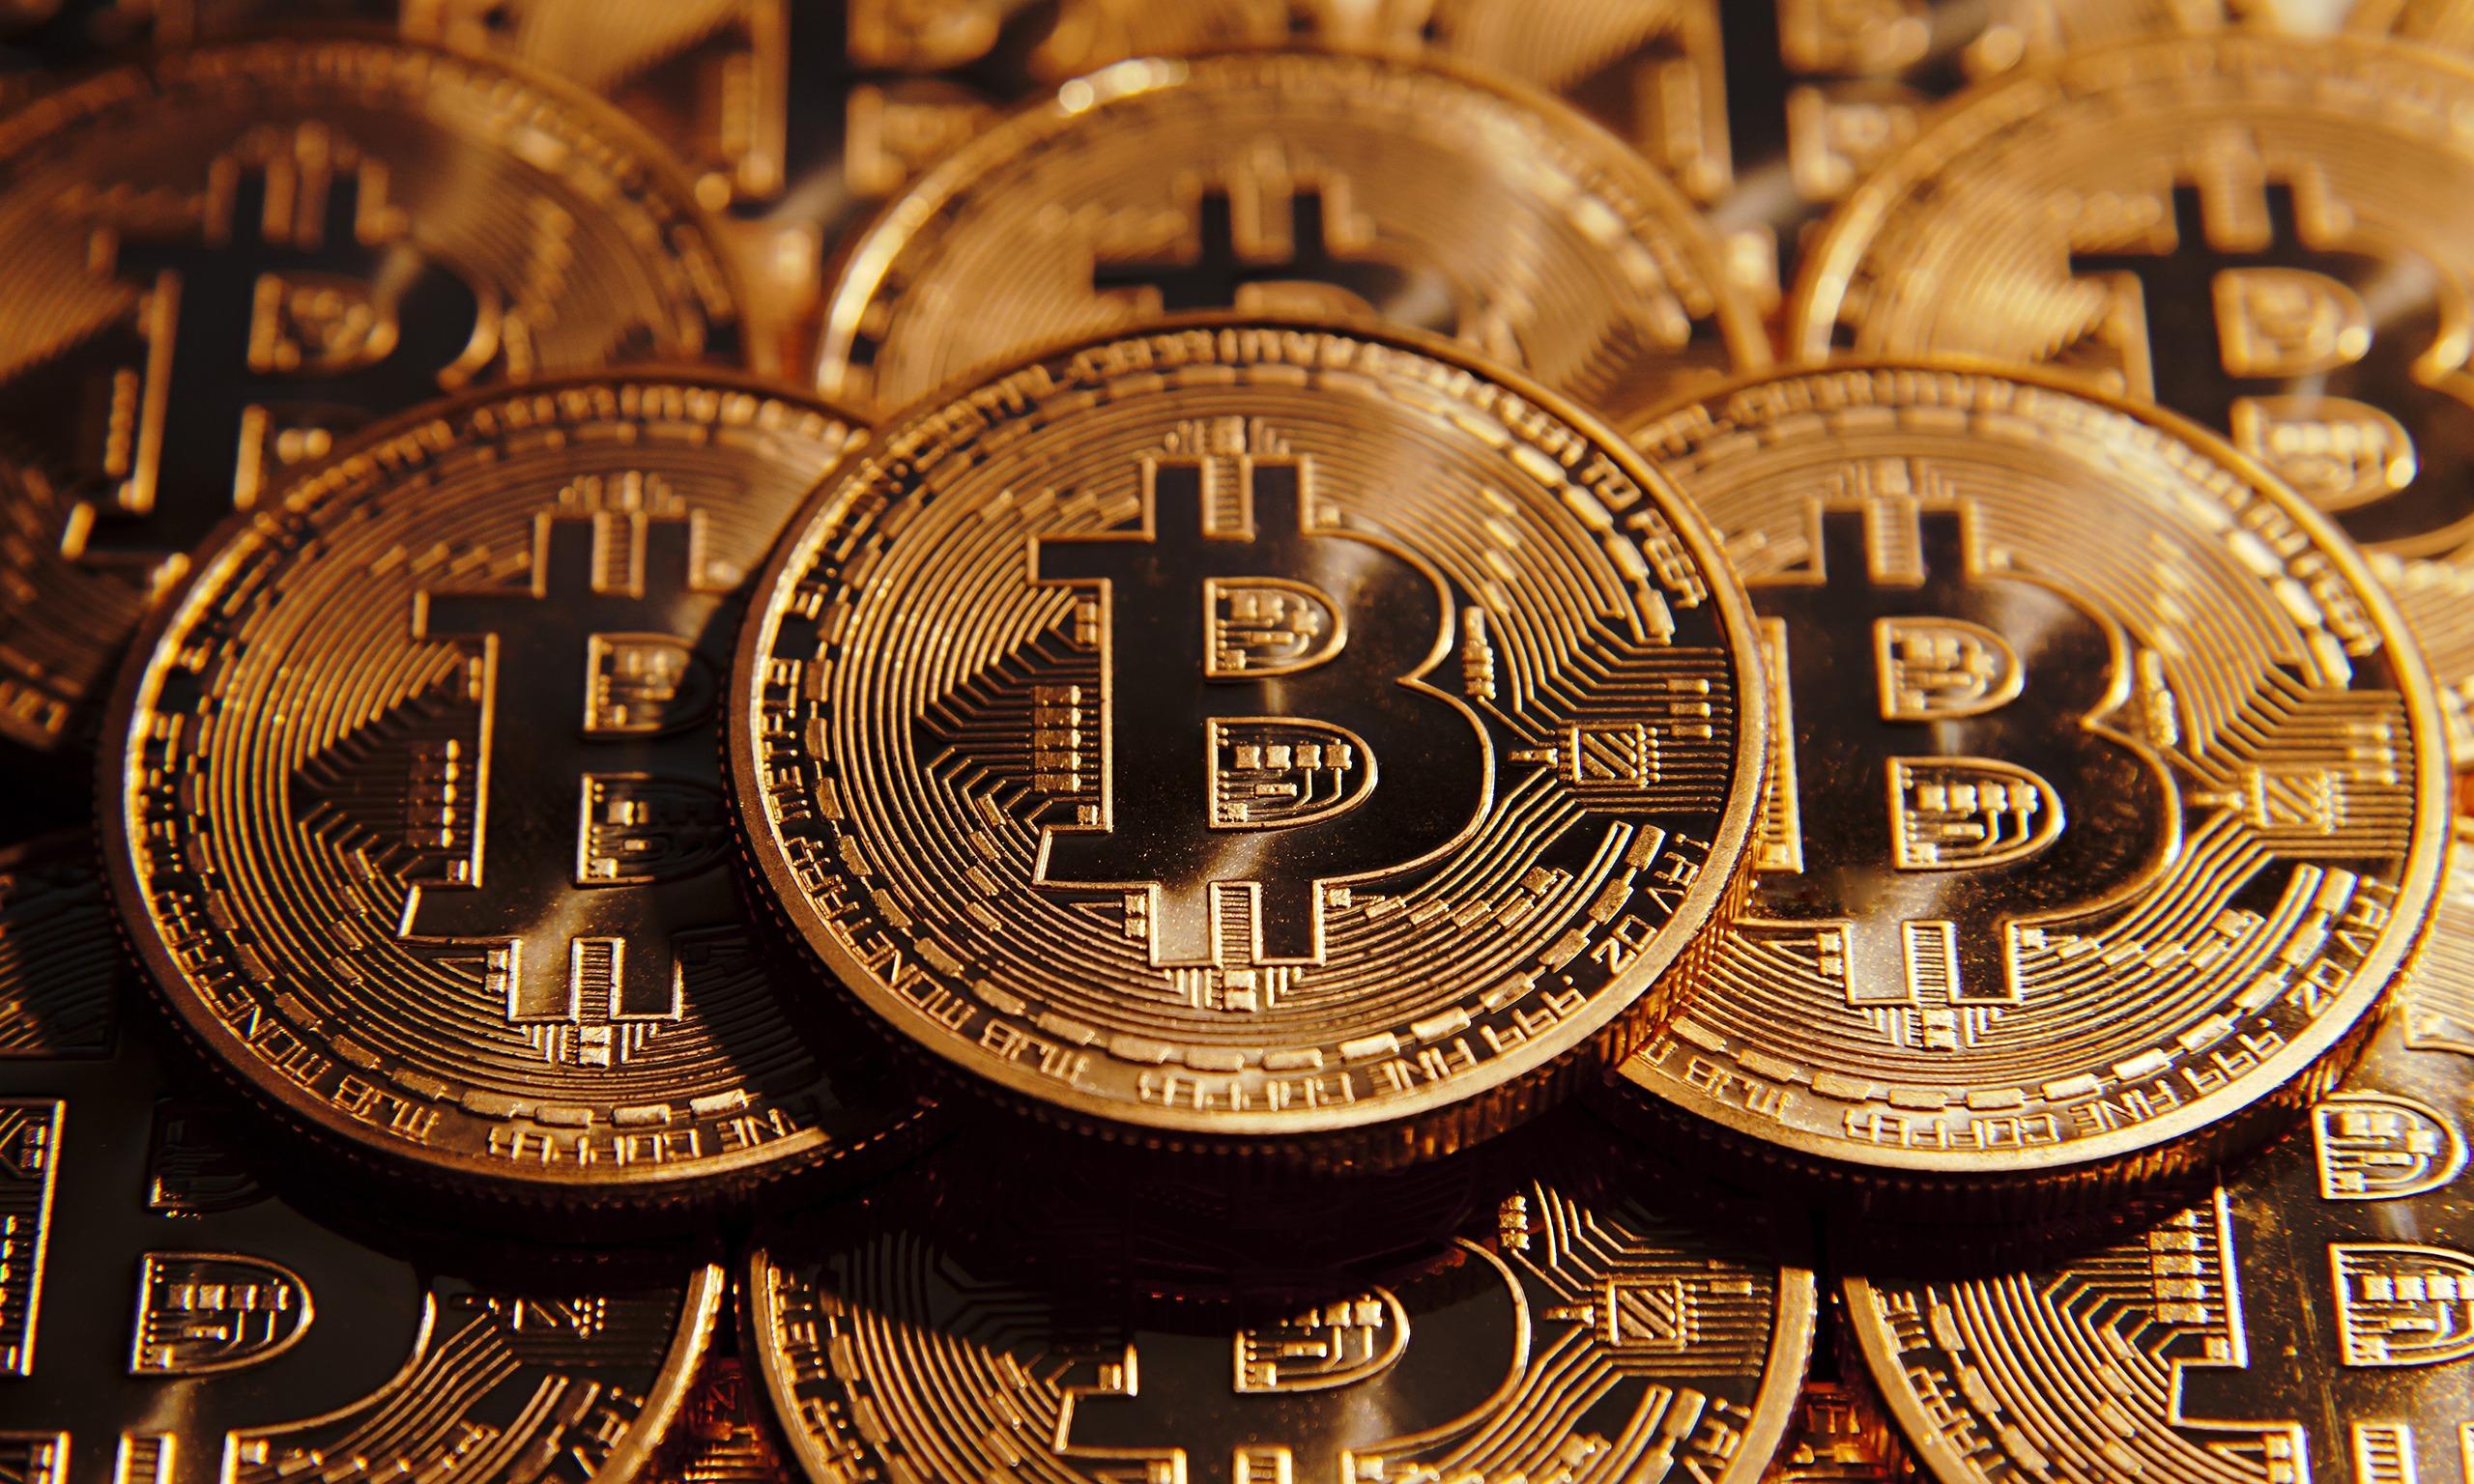 usd į btc mainus bitcoin vs ethereum trading